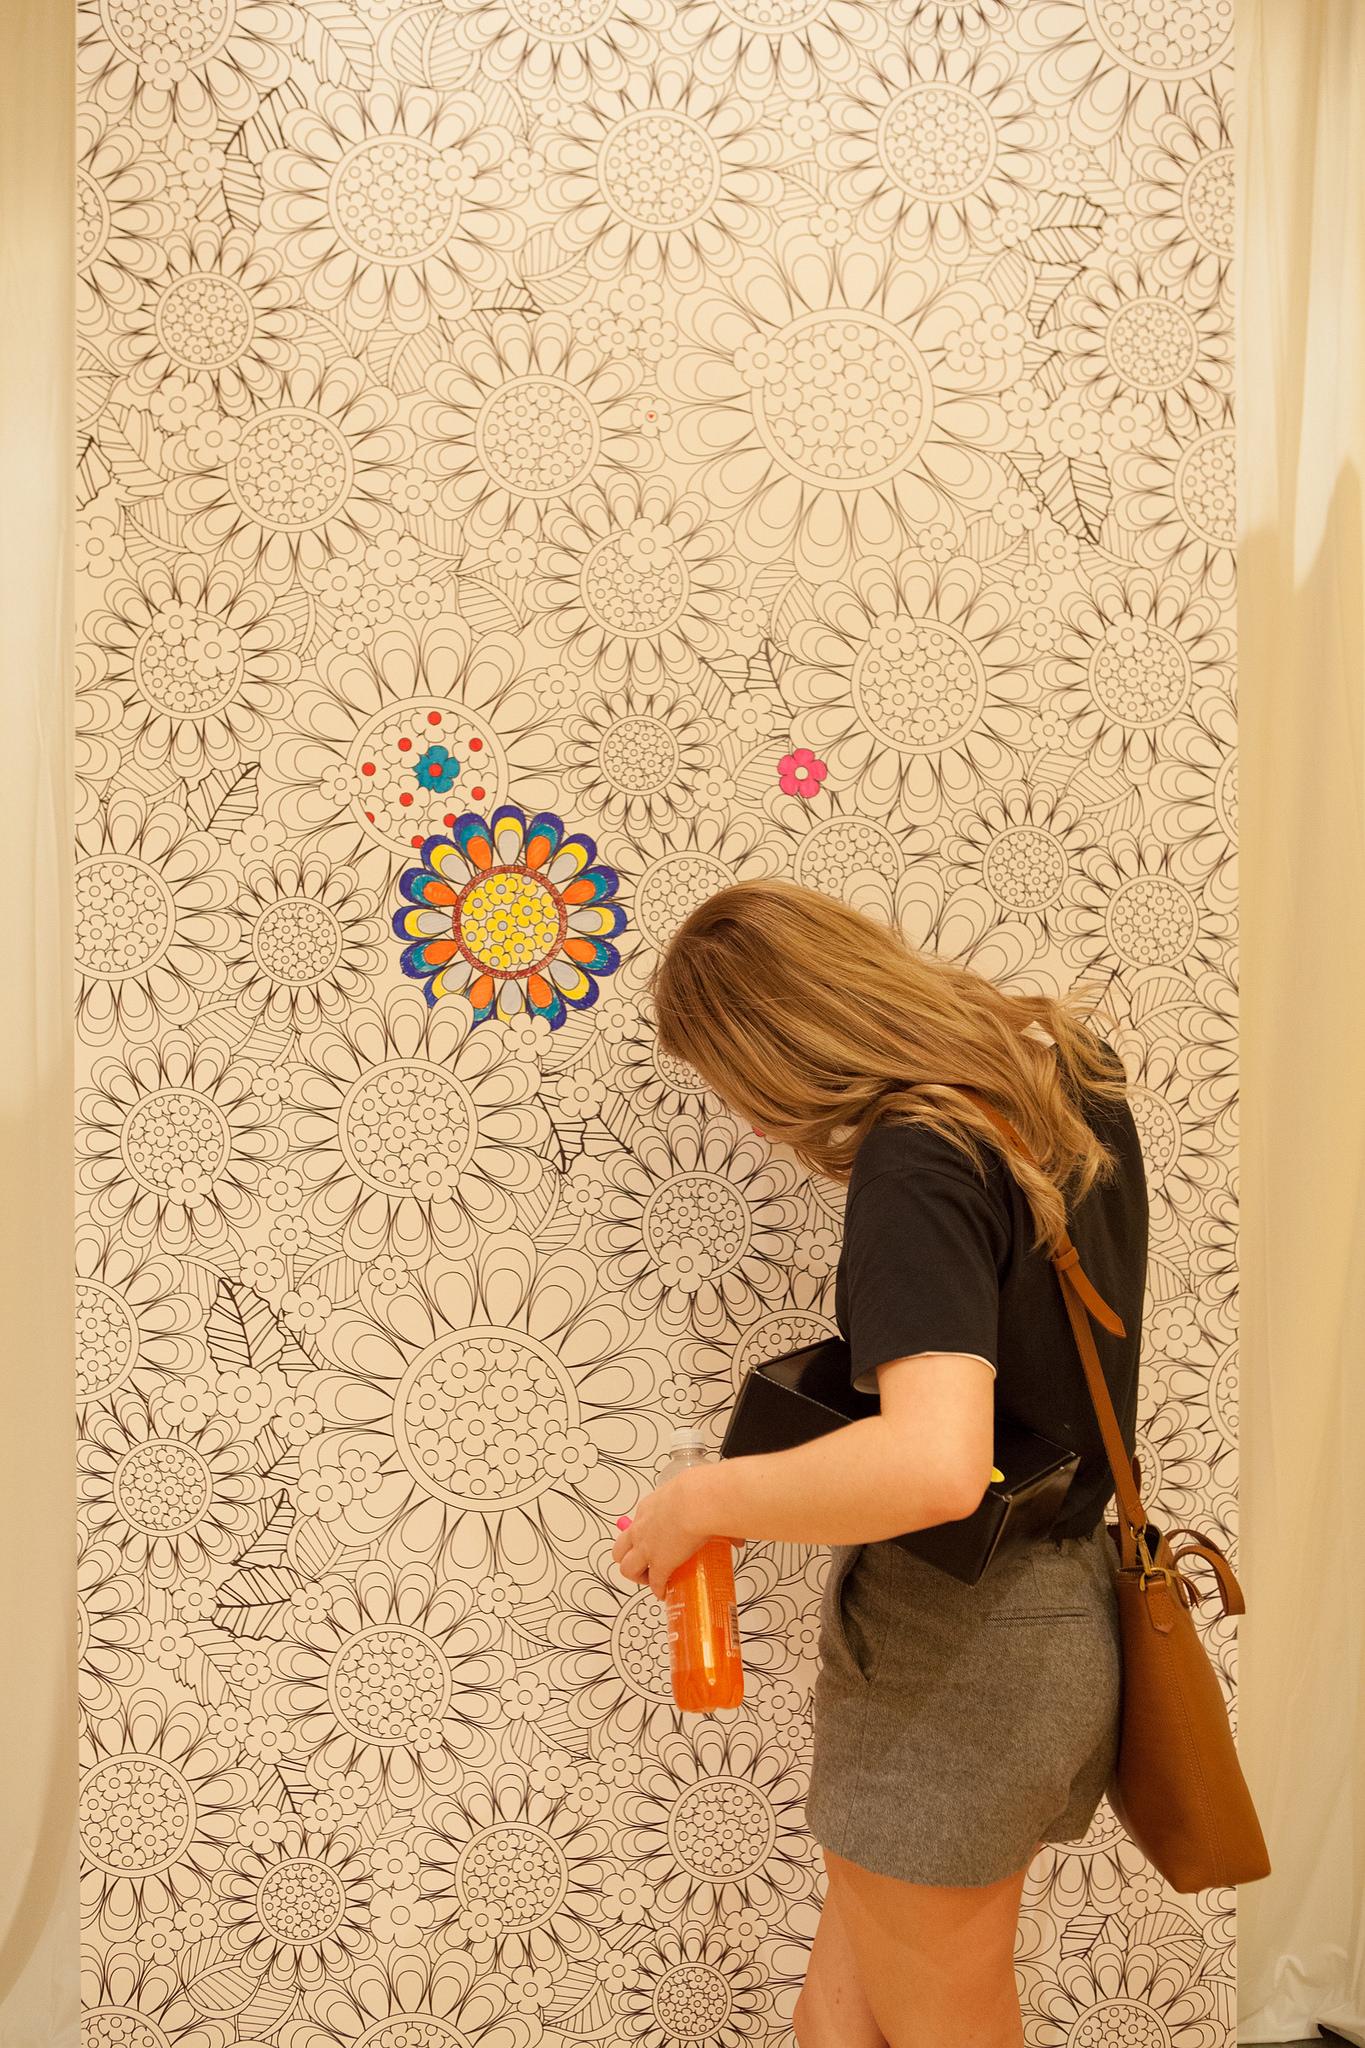 Alt Summer 2015 Squarespace Lounge featuring Artwork by Jenean Morrison